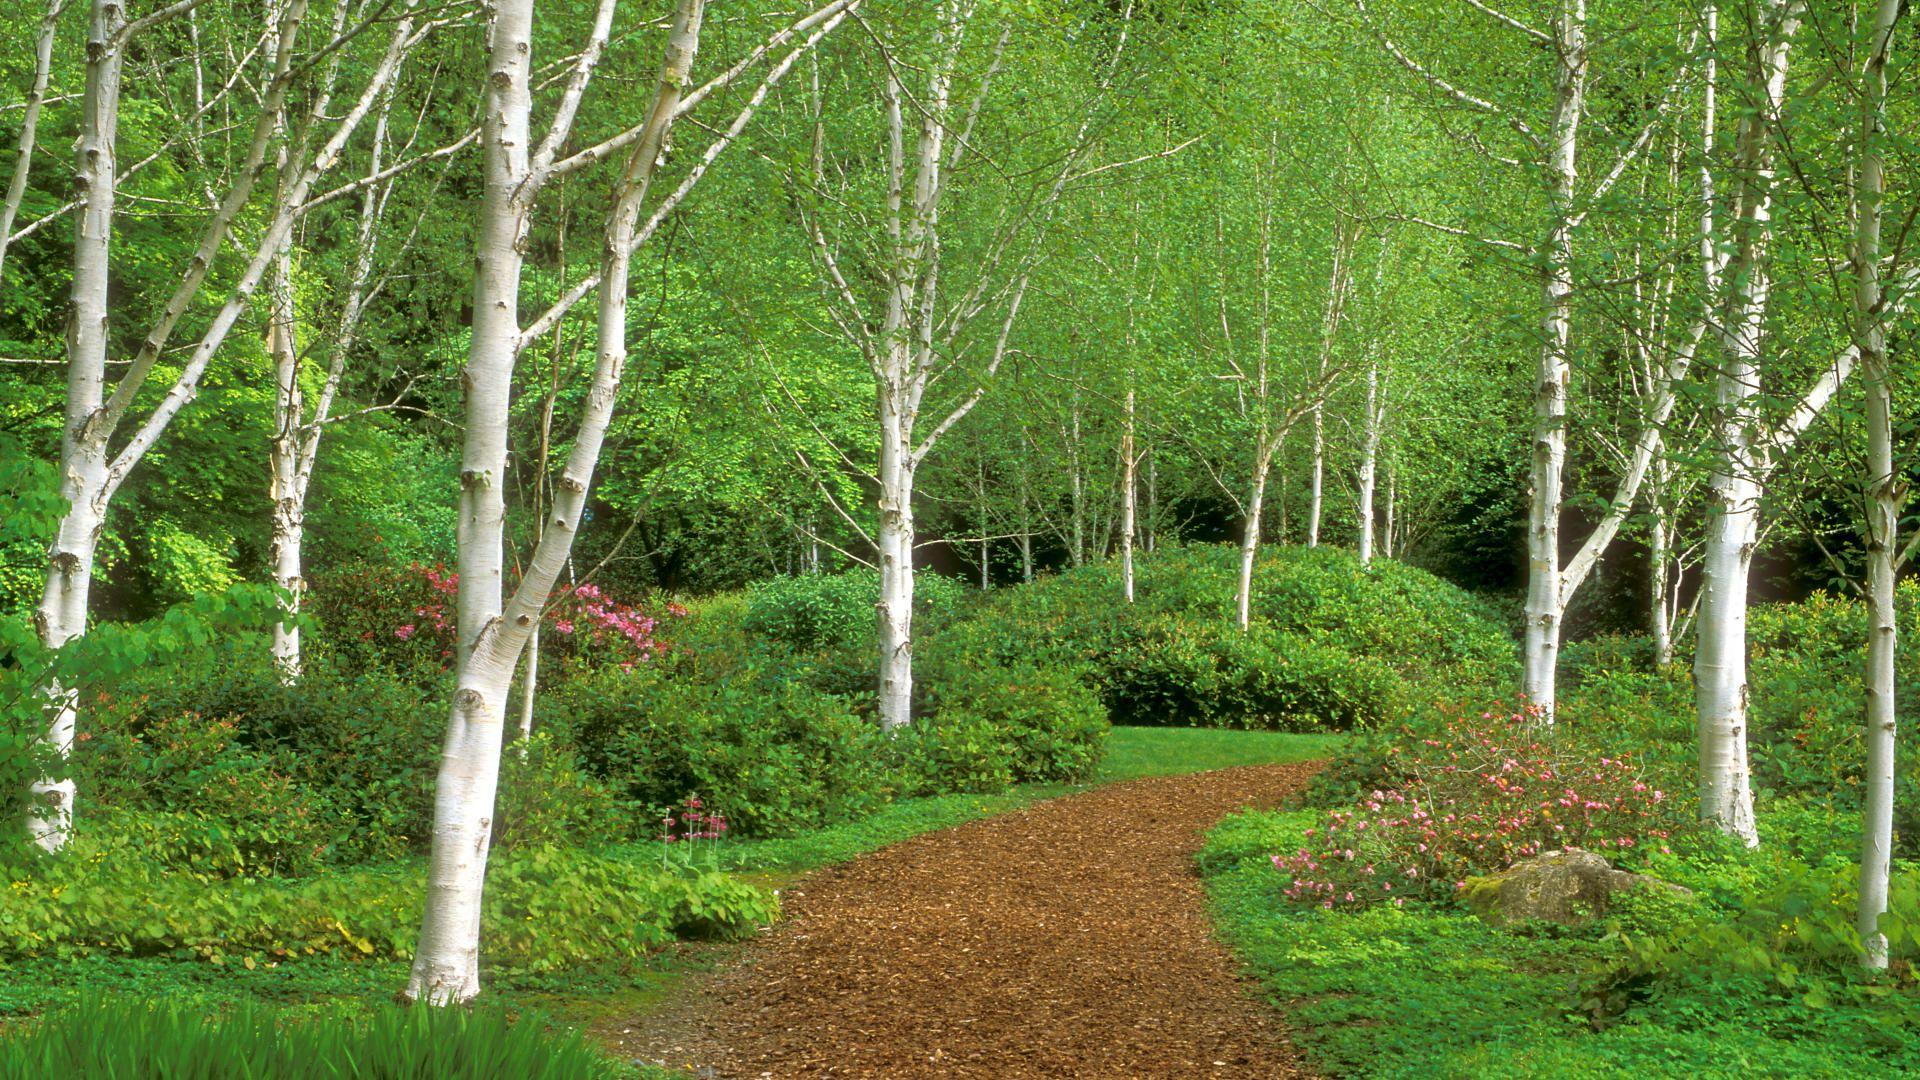 Garden Path, Bloedel Reserve, Bainbridge Island, WA   Http://imashon